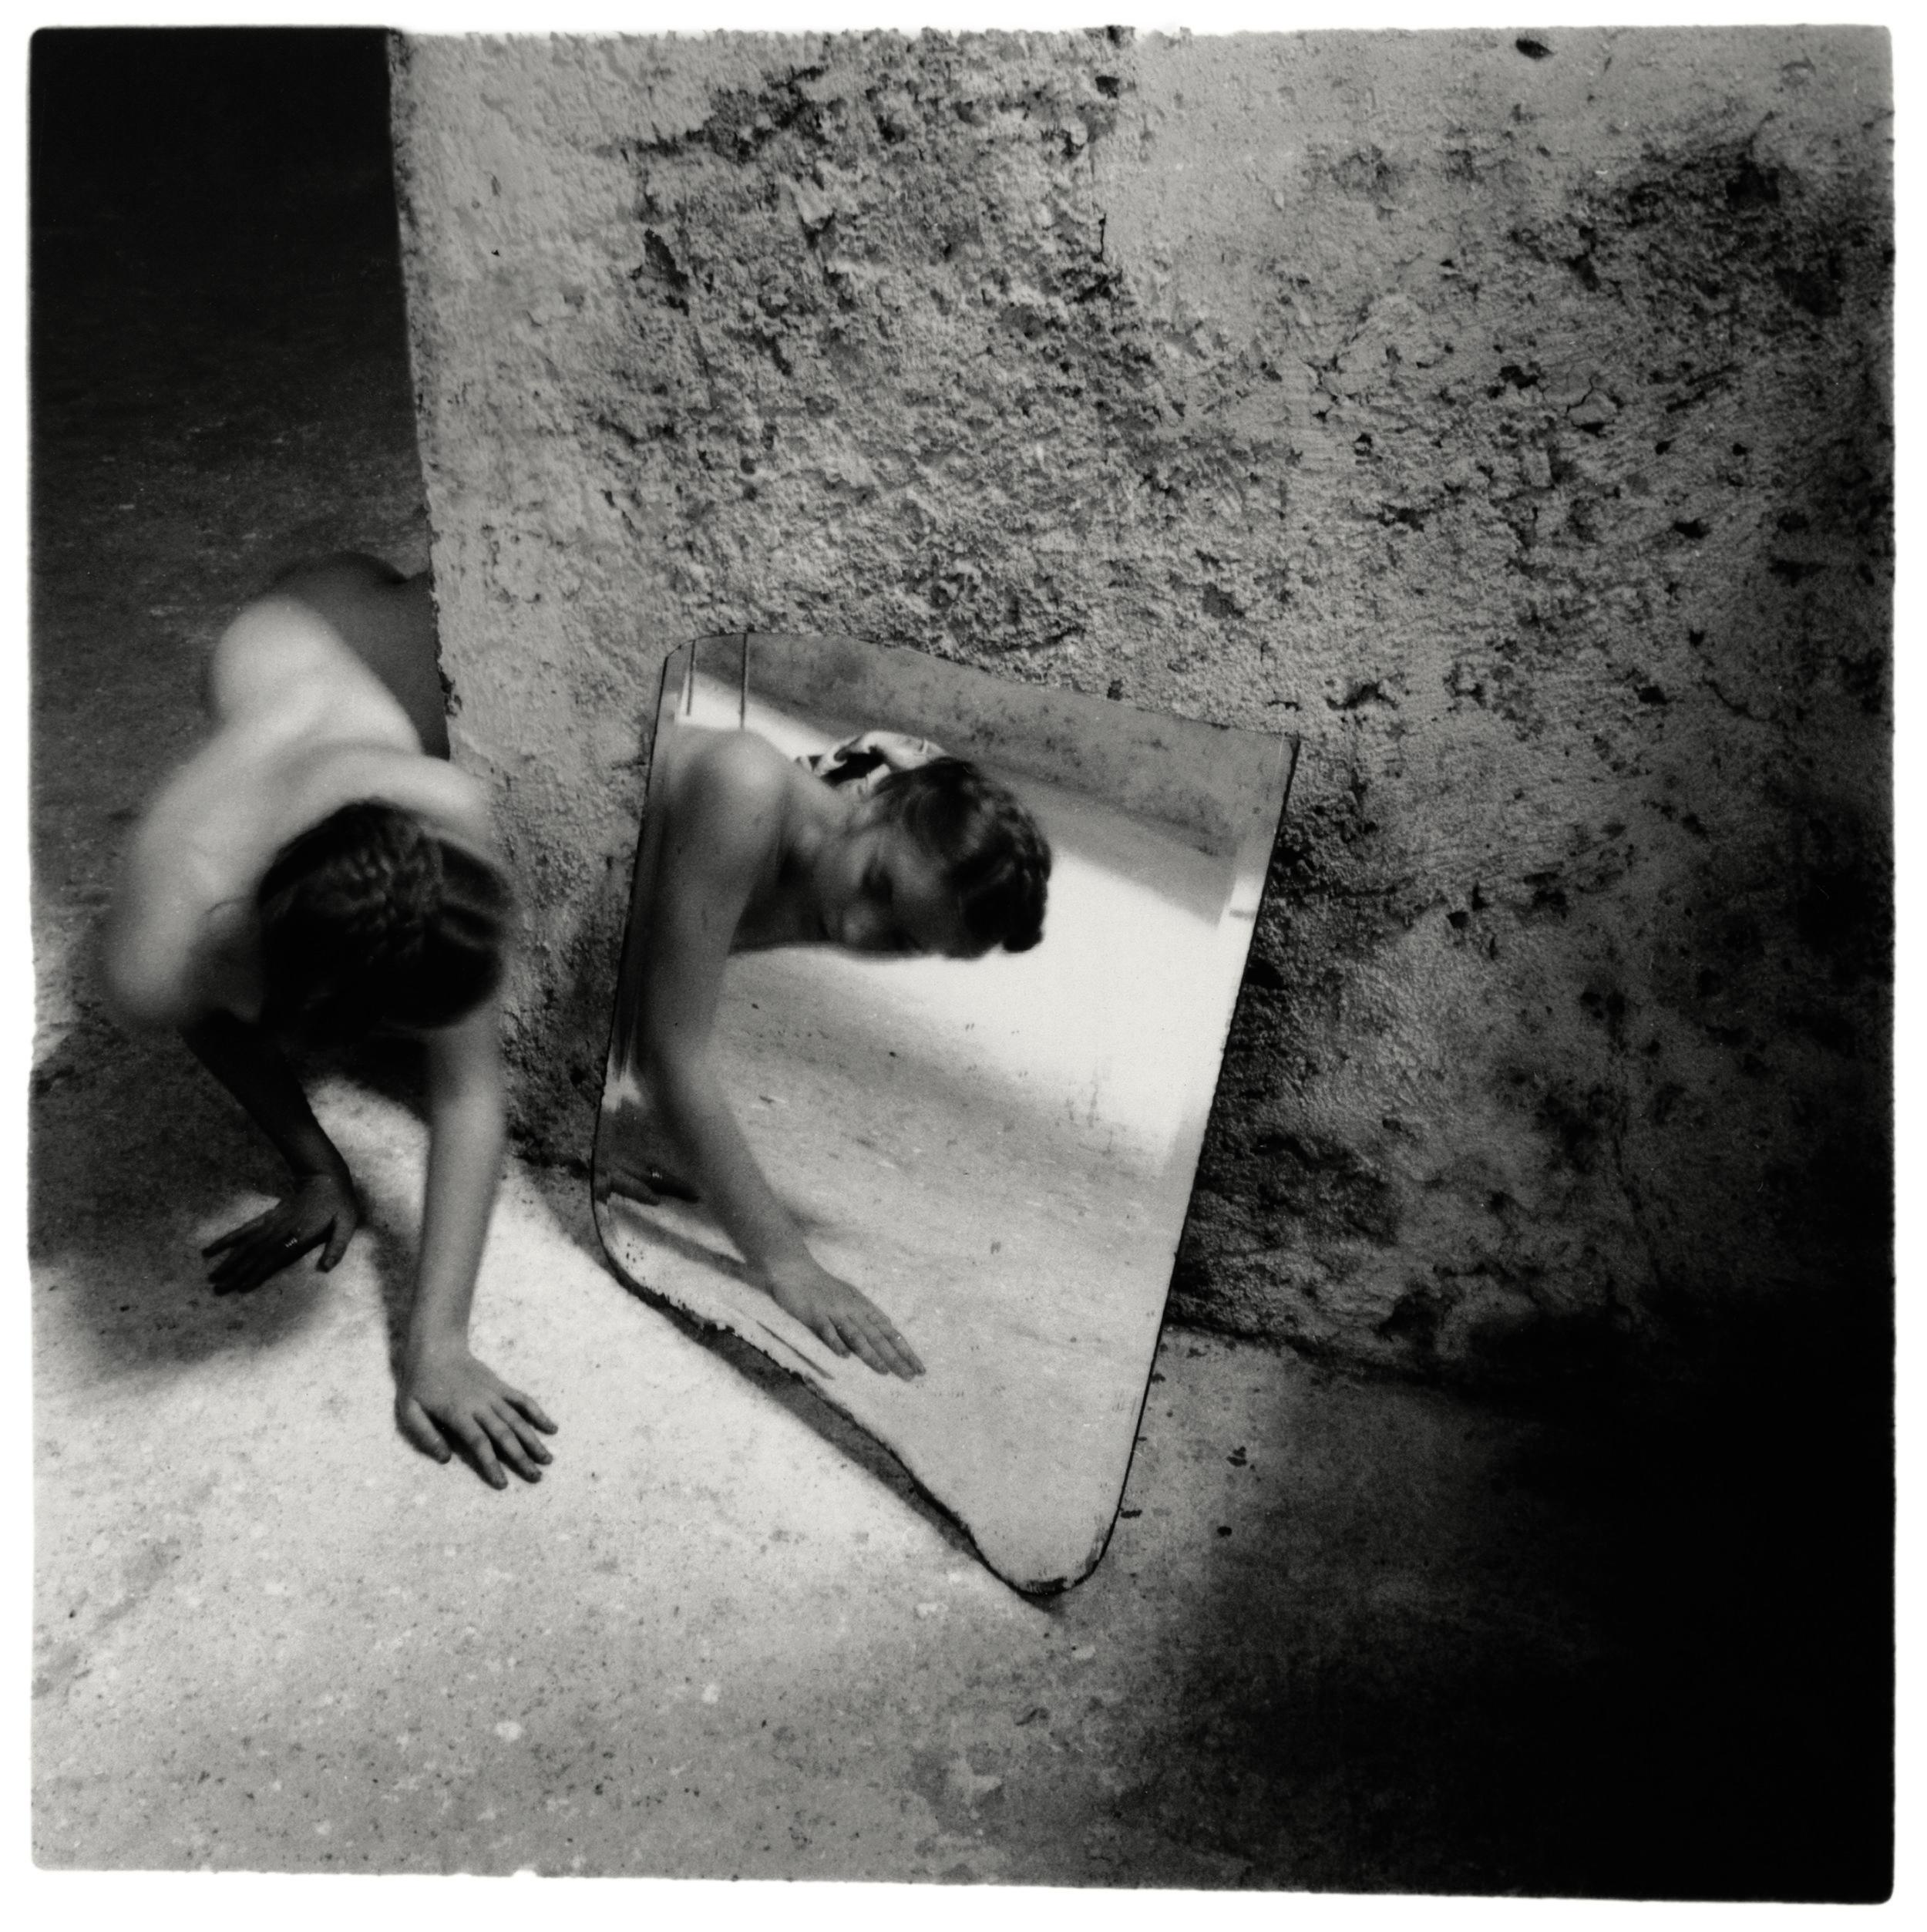 Francesca Woodman,Self-deceit #1, Rome, Italy, 1978/1979,© Courtesy George and Betty Woodman, New York /The SAMMLUNG VERBUND Collection, Vienna